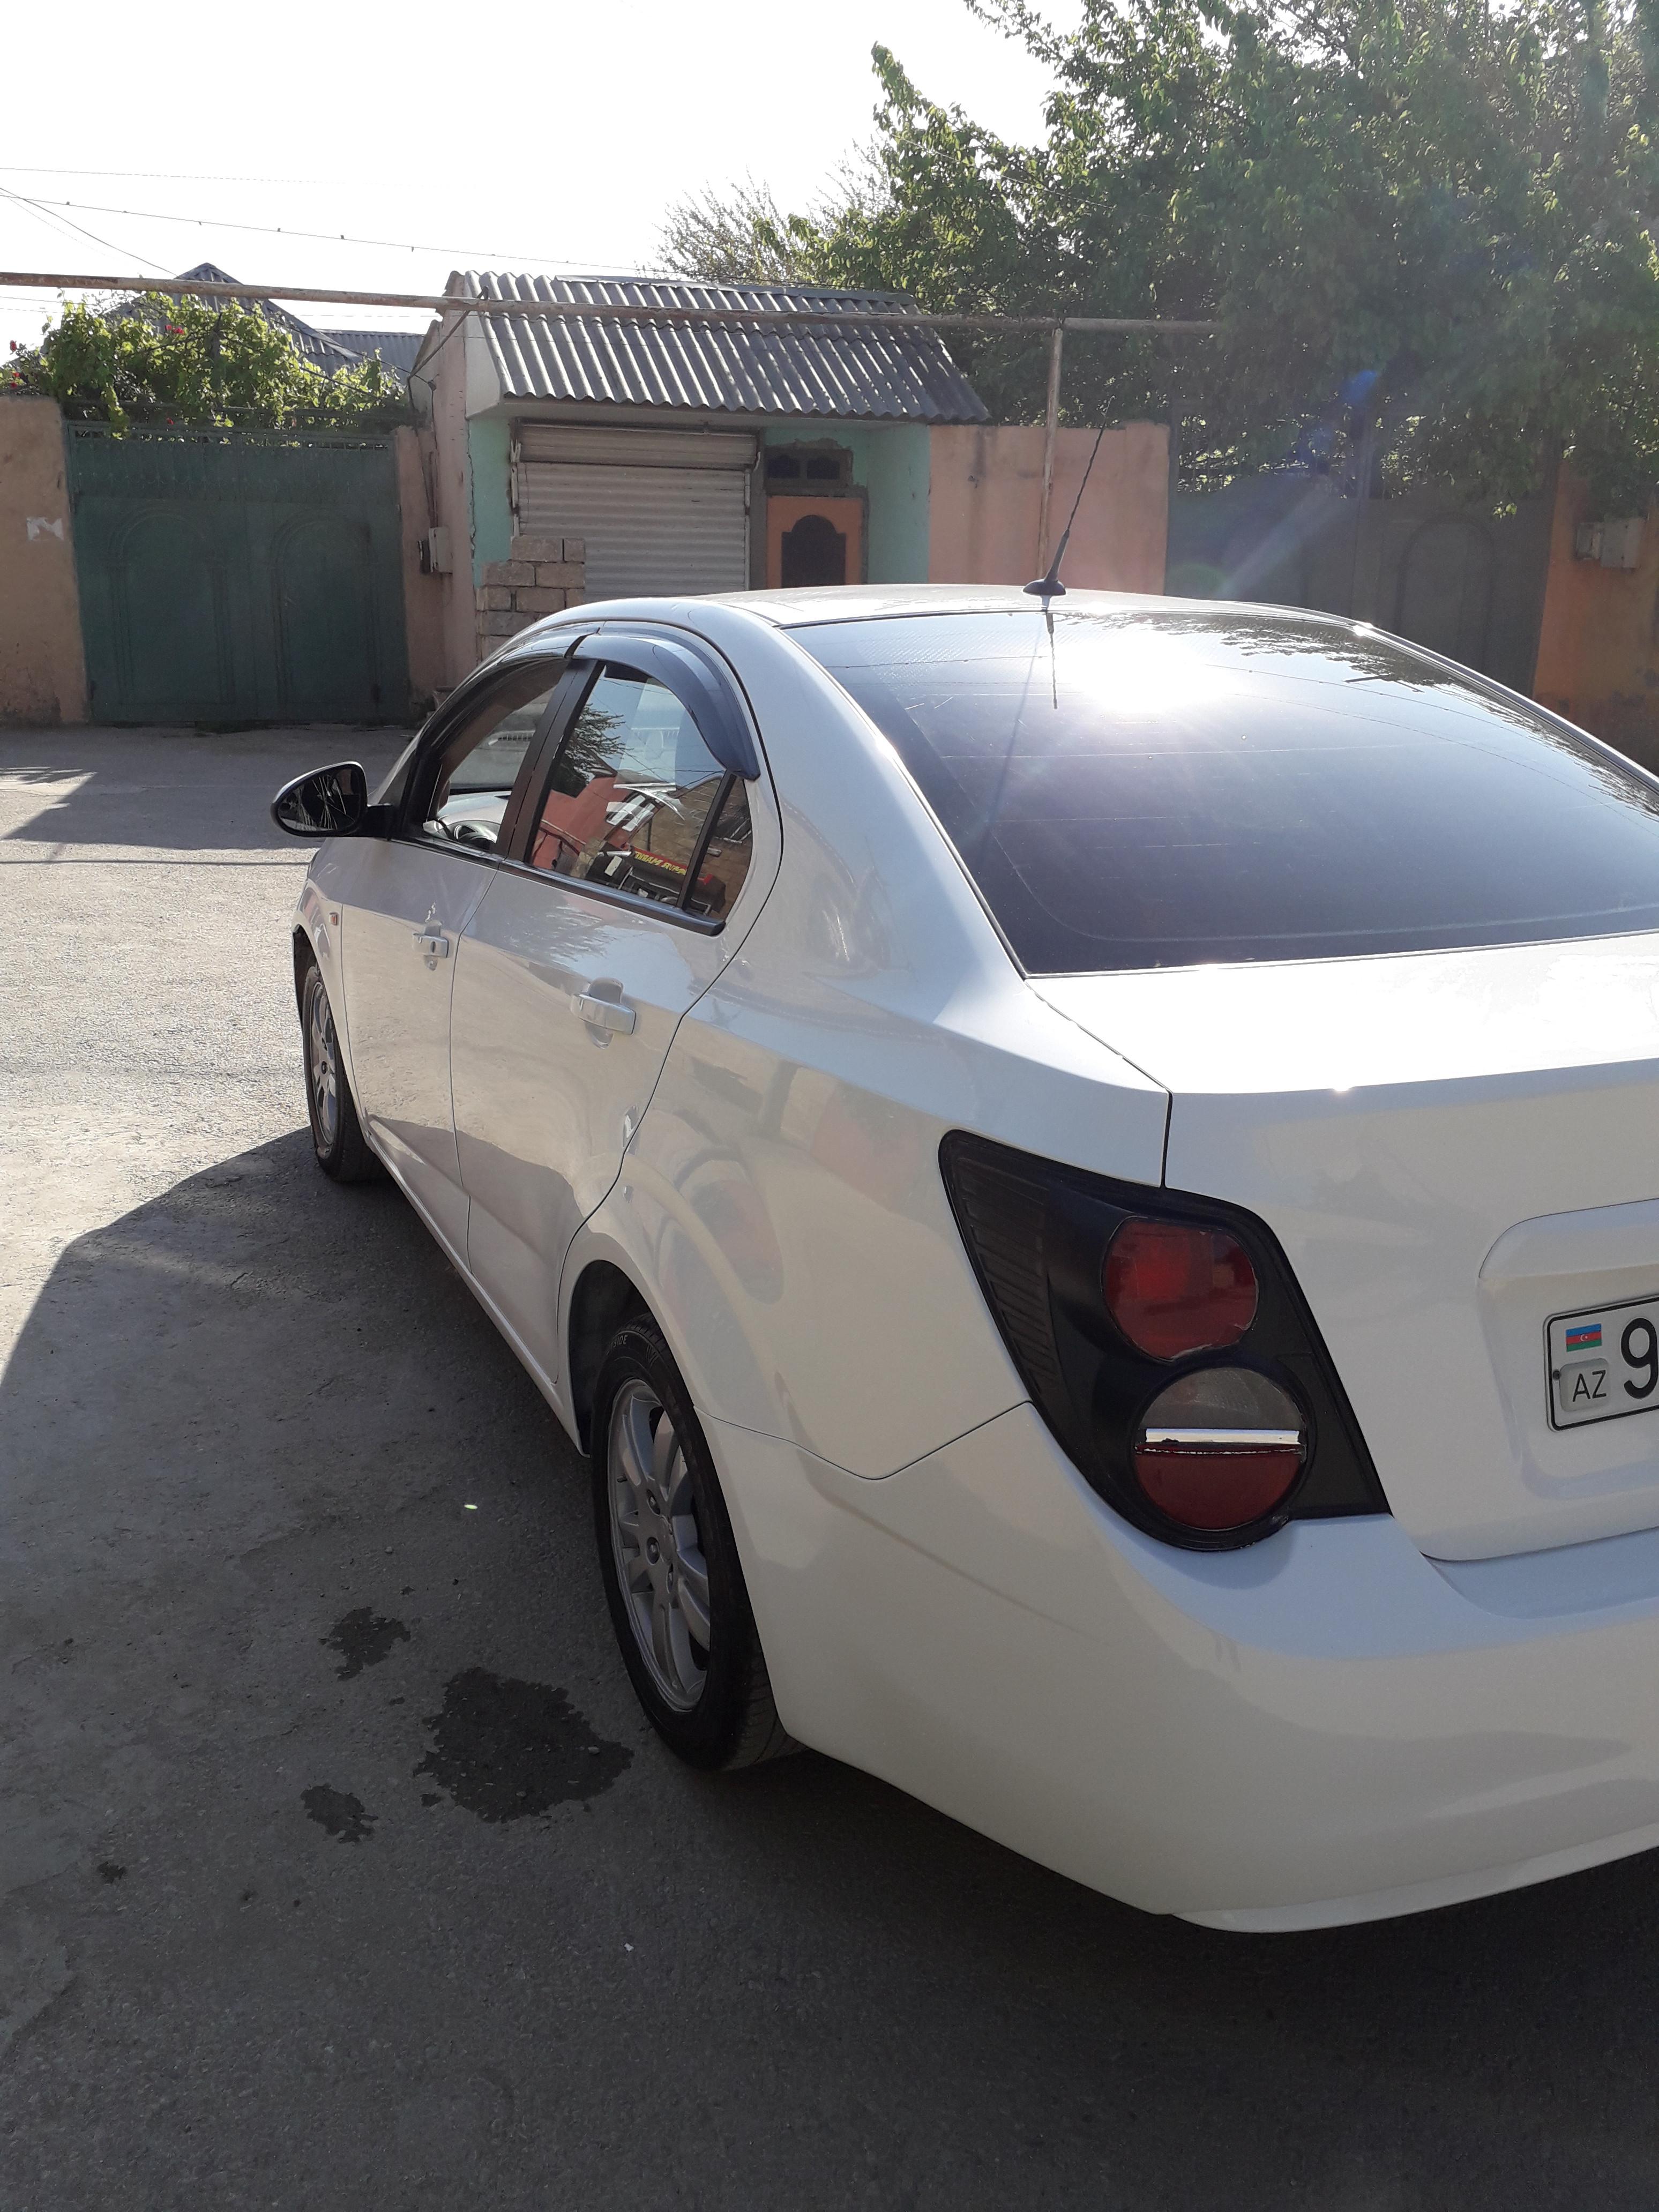 Chevrolet Aveo 1.4(lt) 2012 İkinci əl  $6500